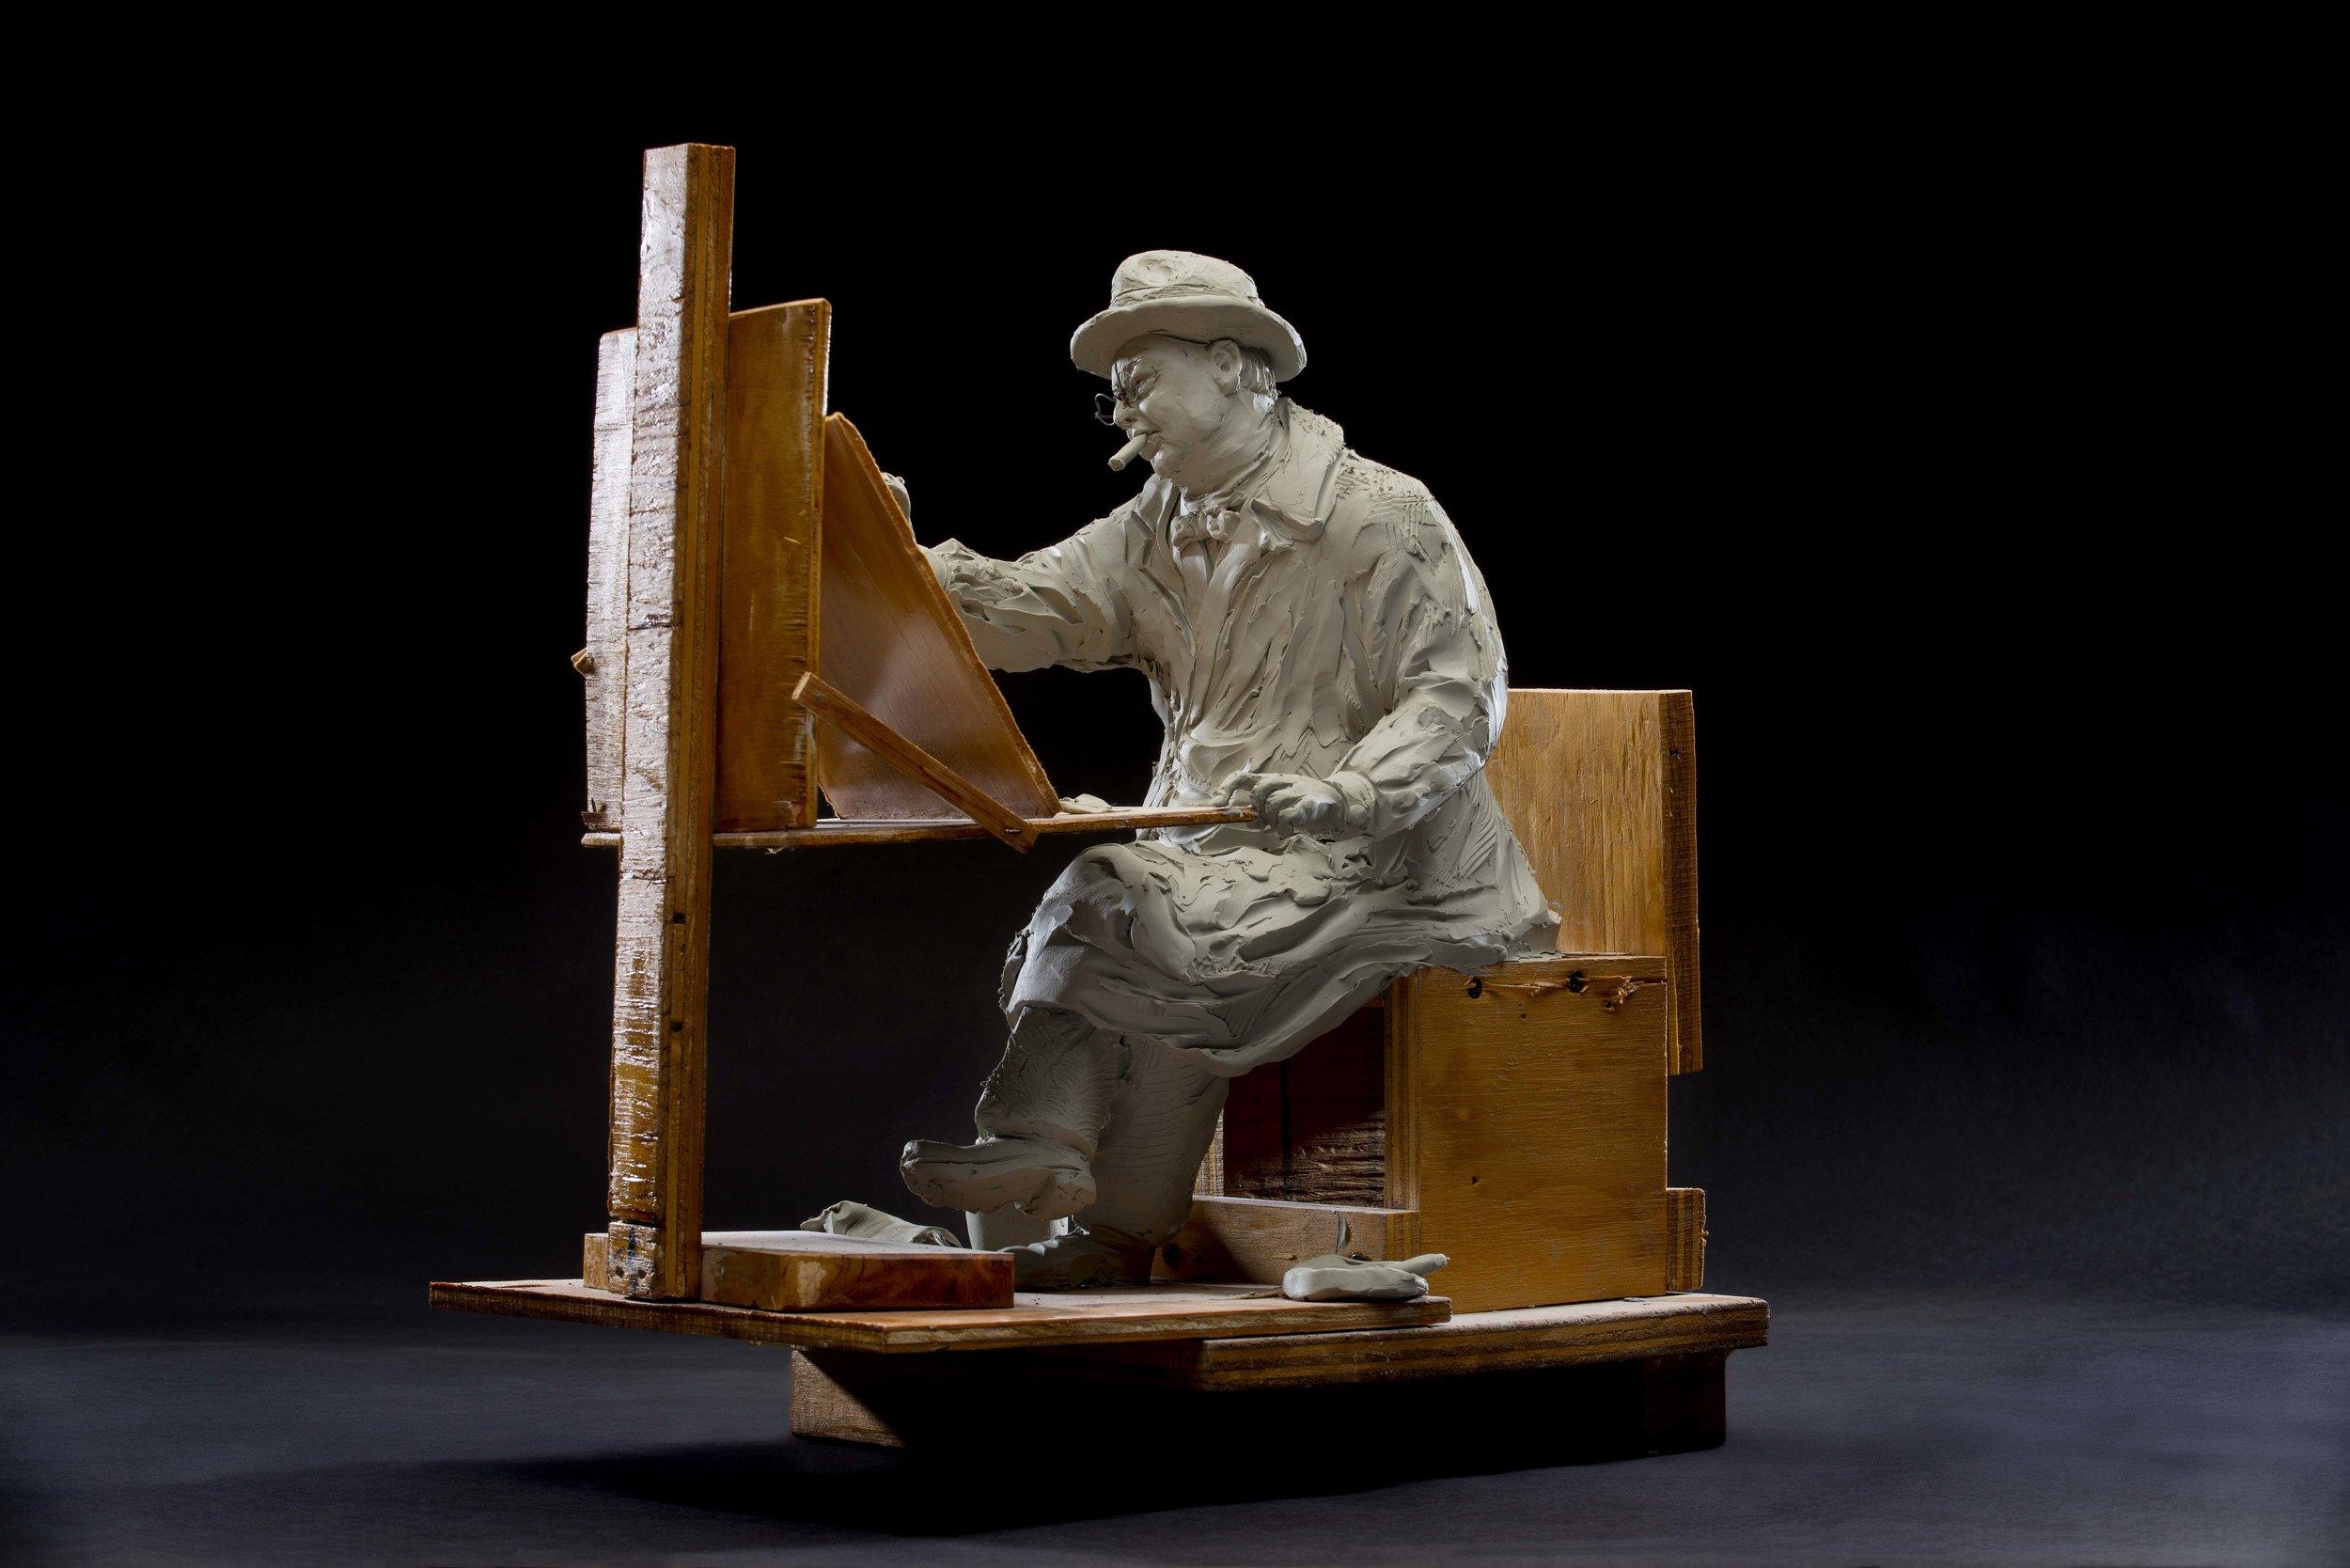 """ Maquette  for Churchill Painting""by Seward Johnson, © 2016 The Seward Johnson Atelier, Inc. Photo by Kenny Ek."